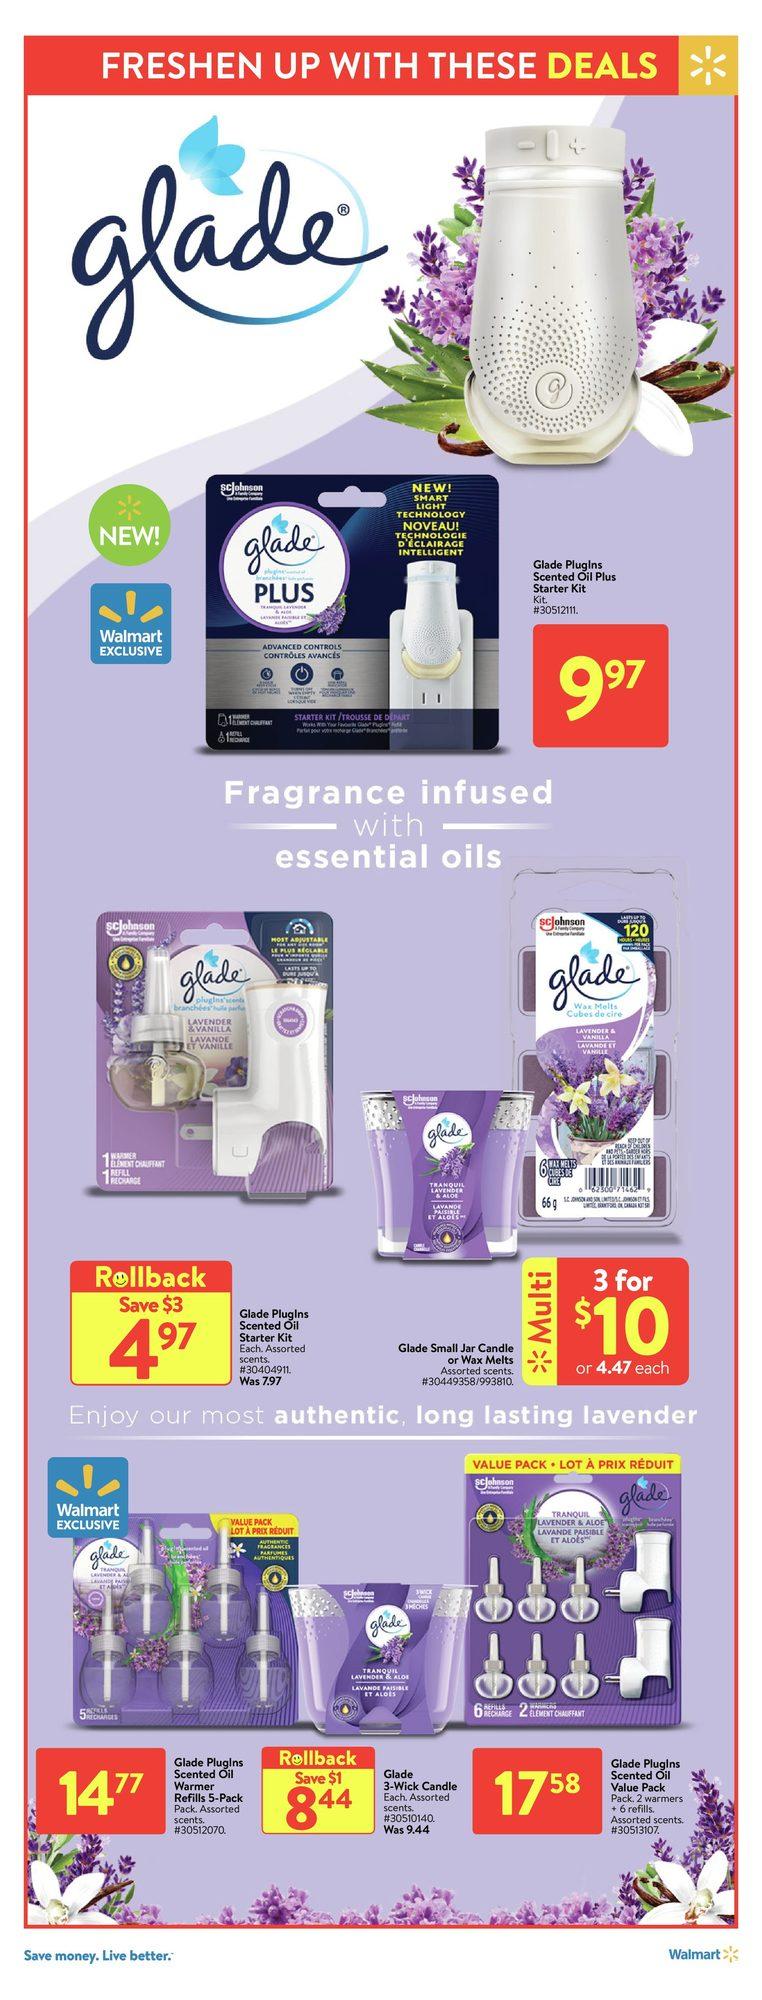 Walmart - Weekly Flyer Specials - Page 6